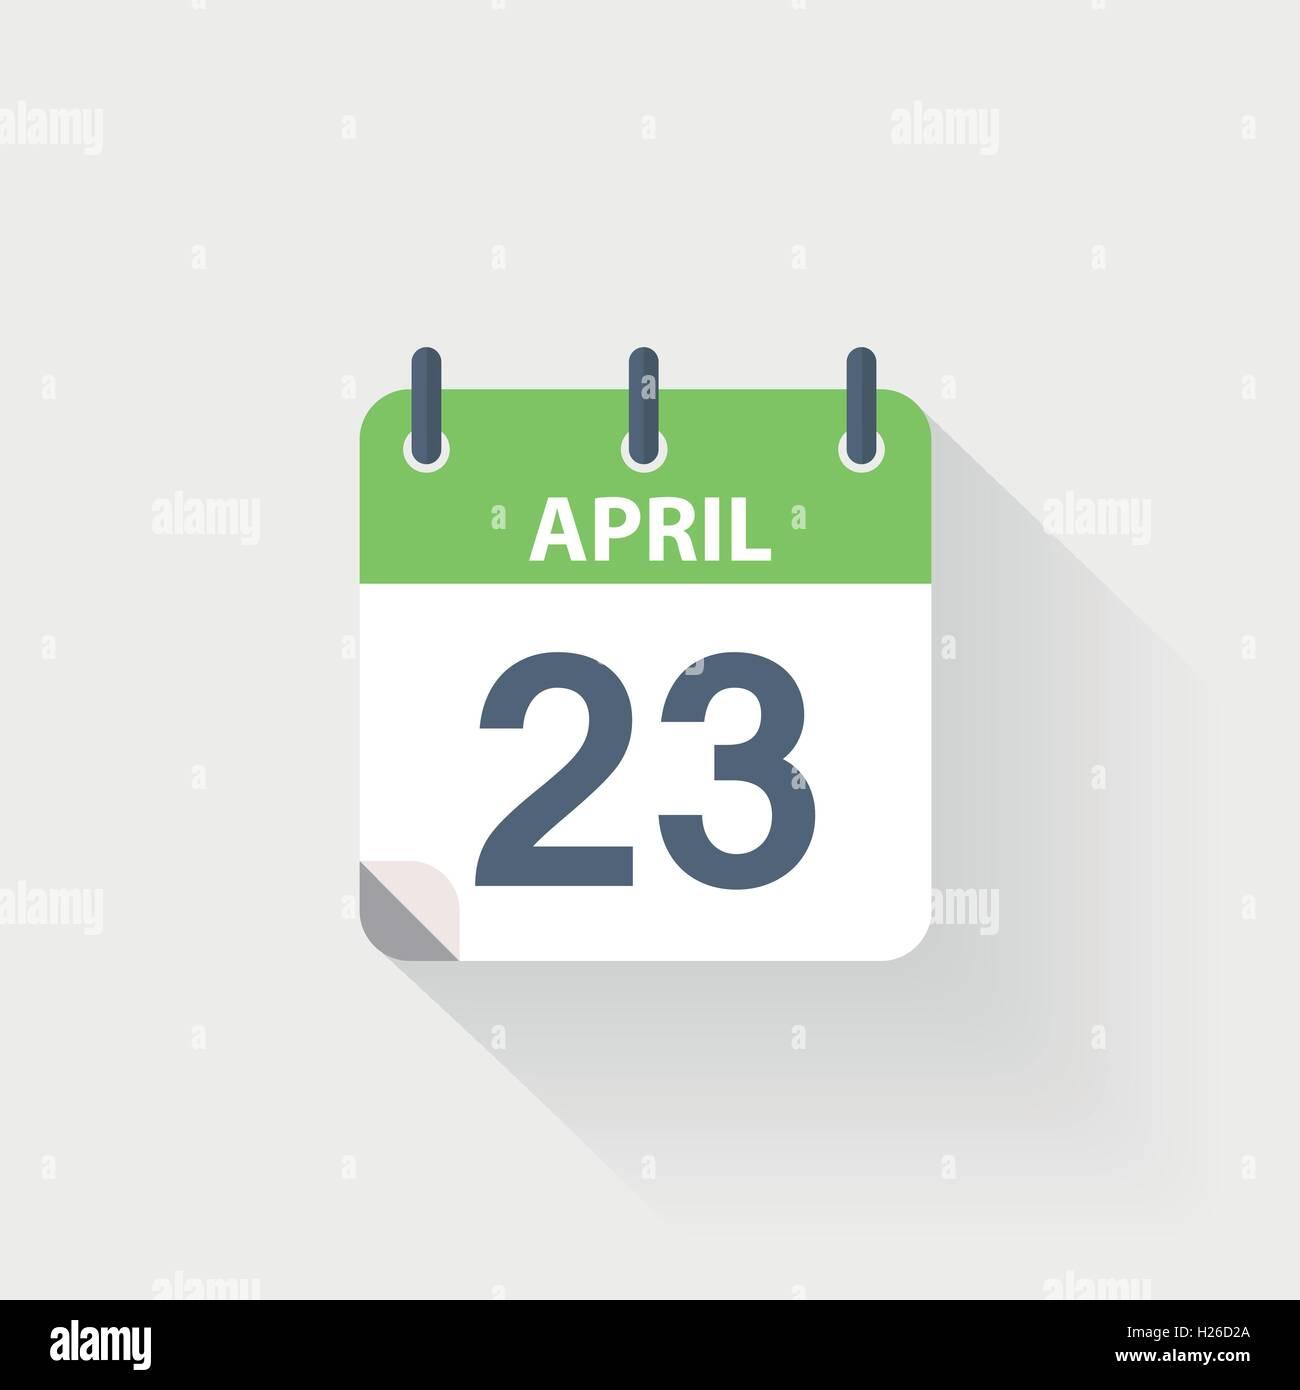 23 april calendar icon on grey background - Stock Vector